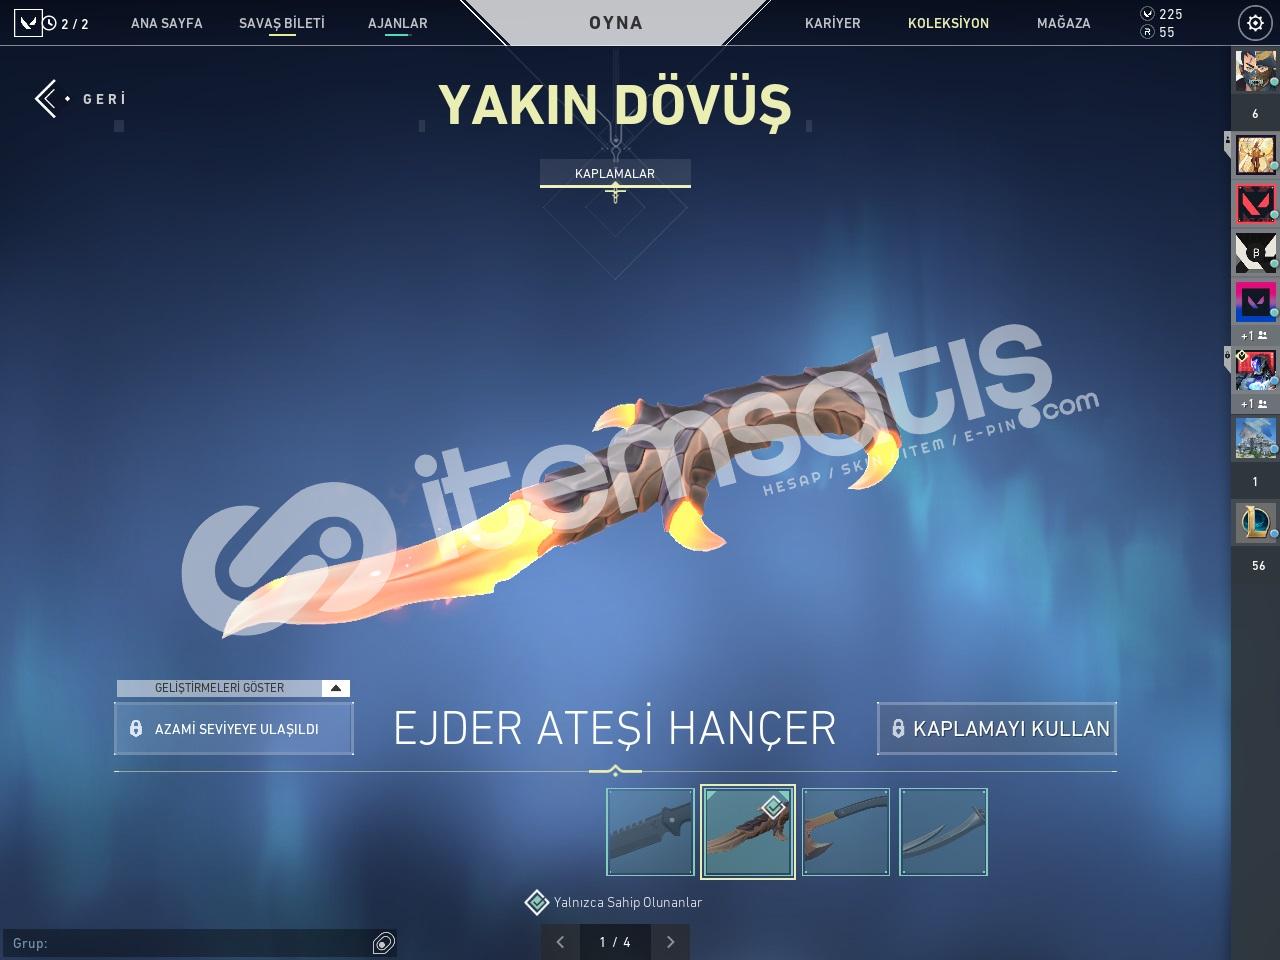 1100 TL YATIRILDI - EJDER BIÇAK OP - 3 VANDAL - 3 PHANTOM